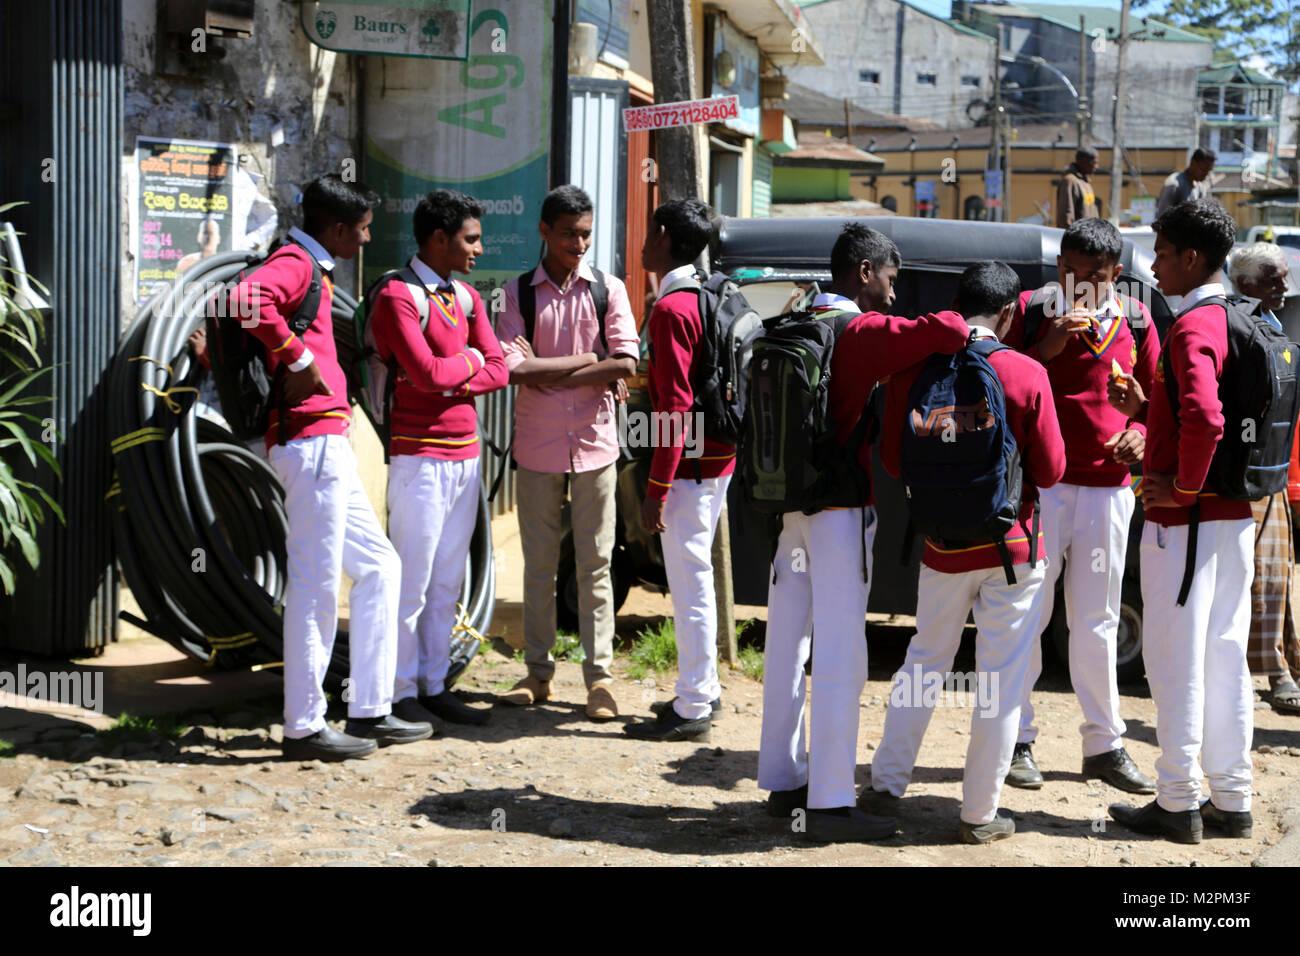 Nuwara Eliya Hill Country Central Province Sri Lanka Group of School Children - Stock Image